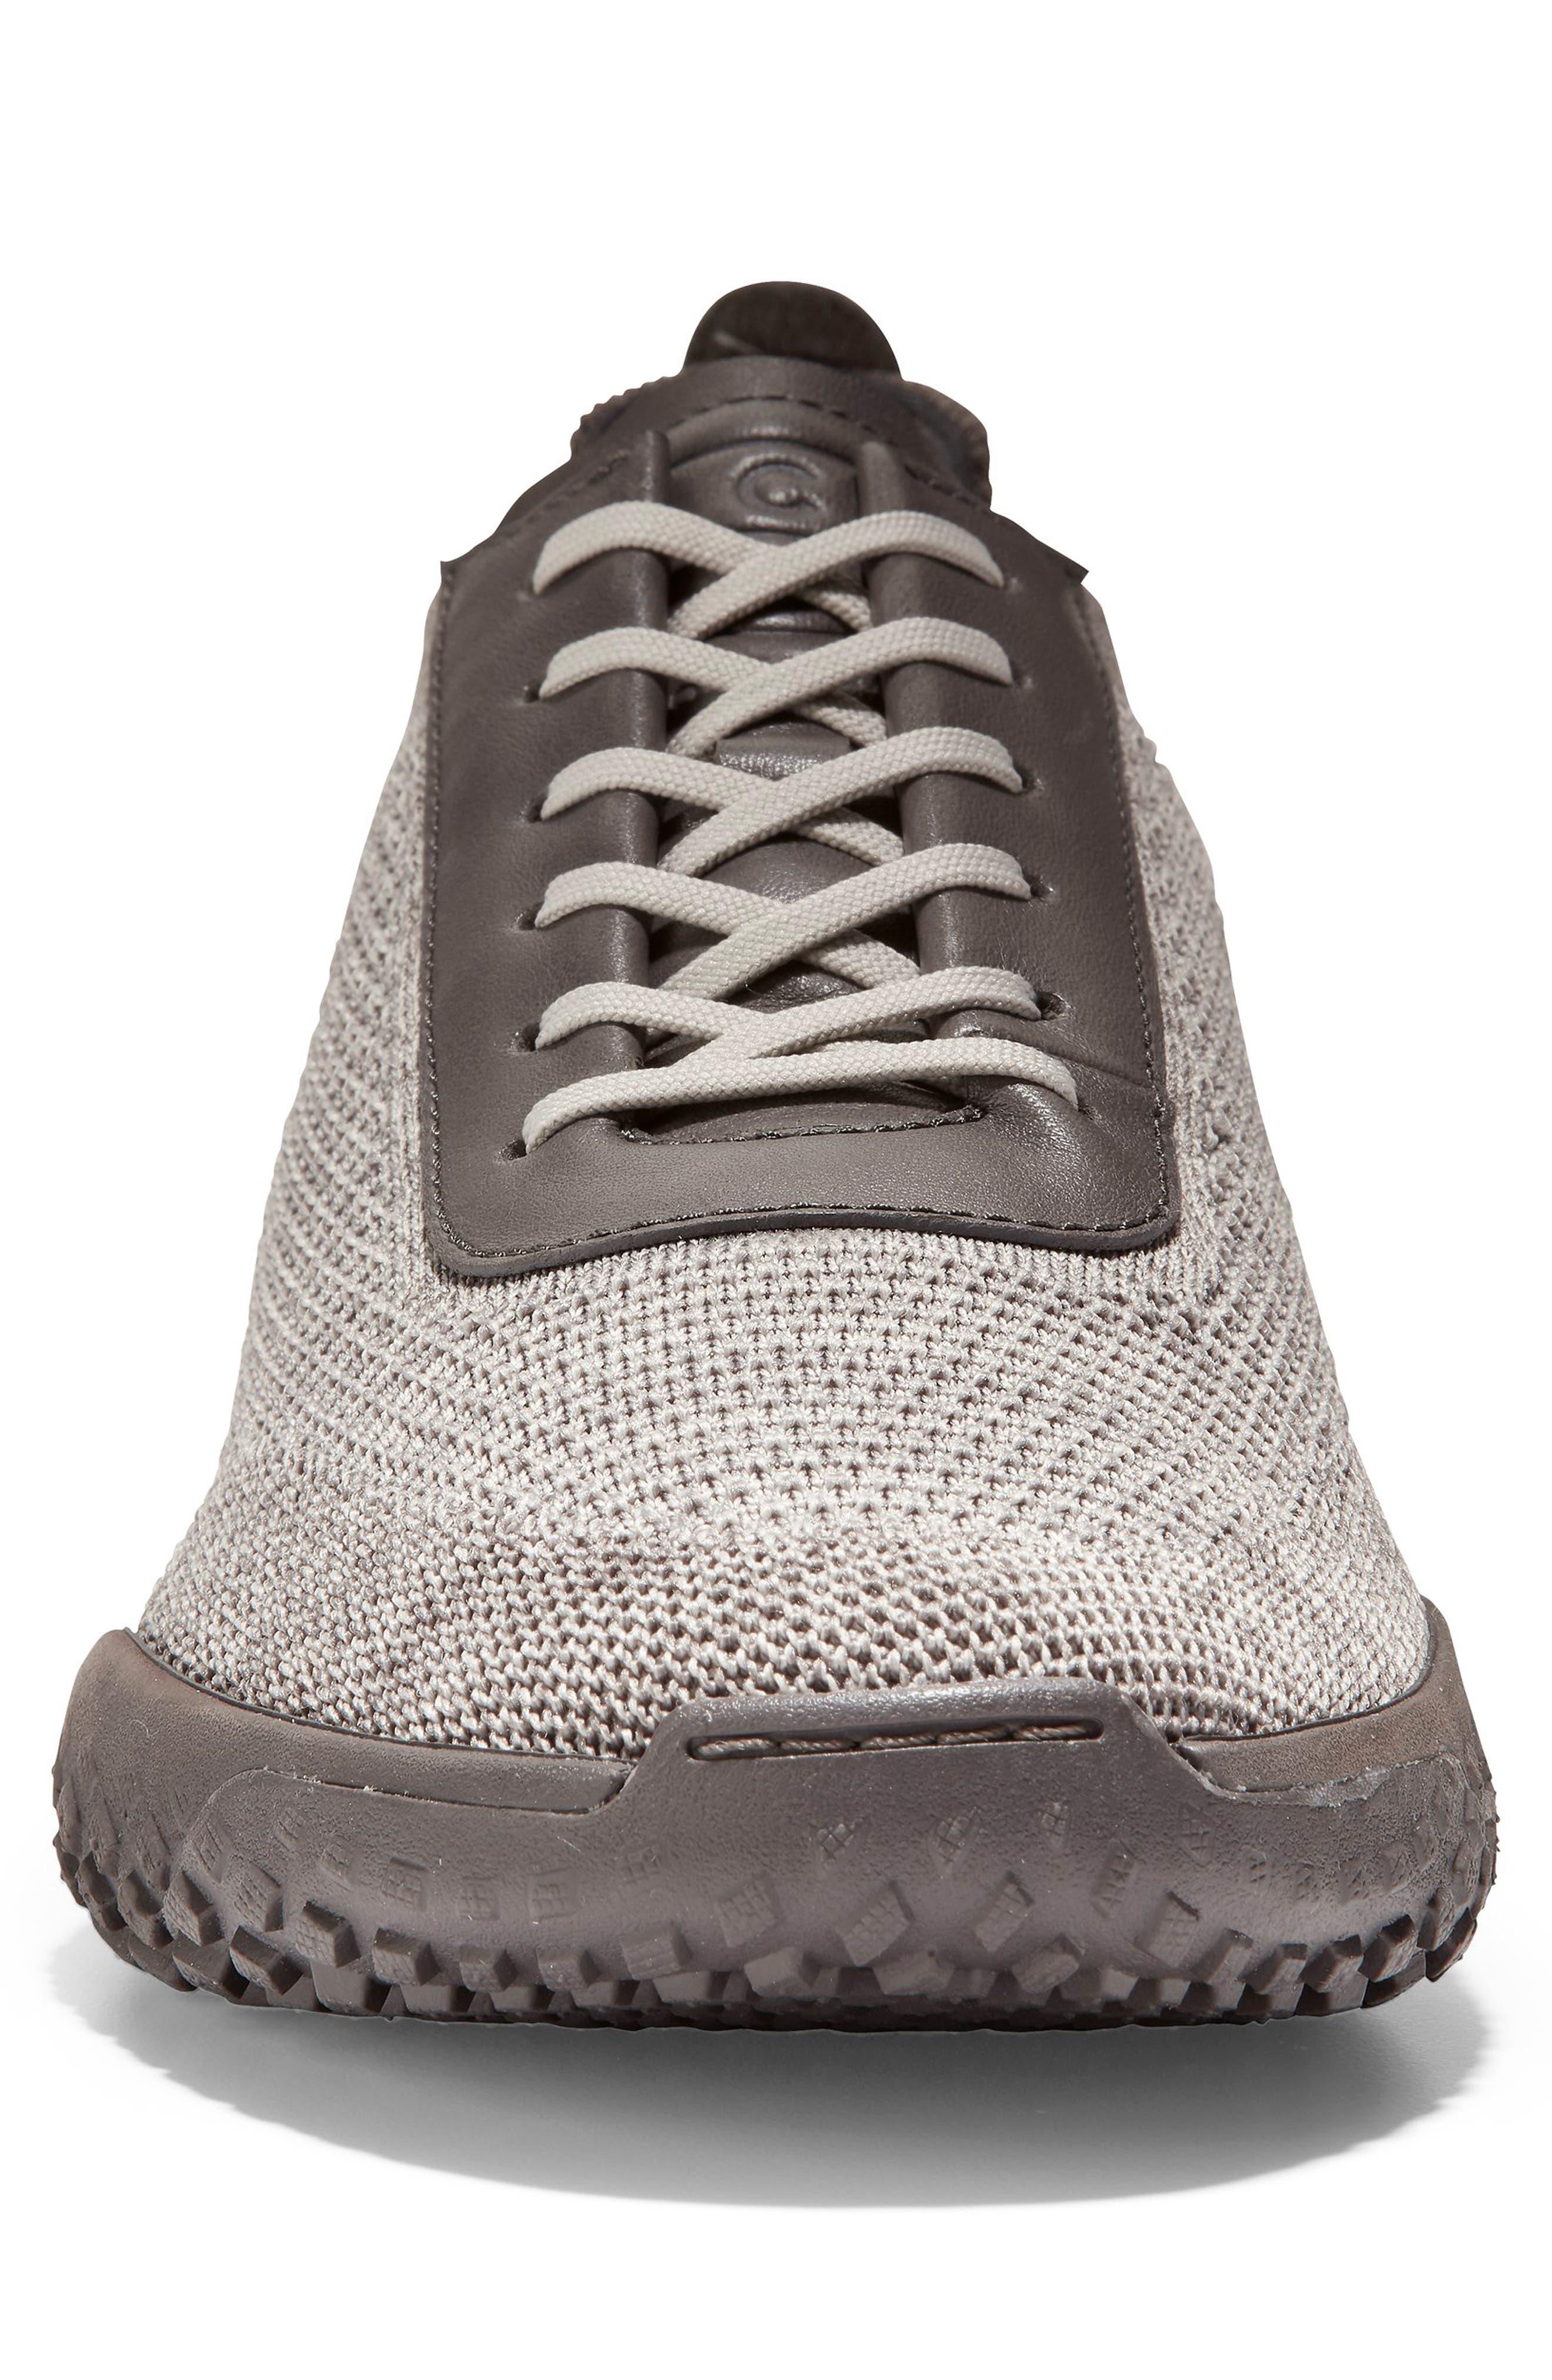 GrandPro Trail Low Stitchlite Sneaker,                             Alternate thumbnail 4, color,                             BLACK/ VAPOR GREY KNIT